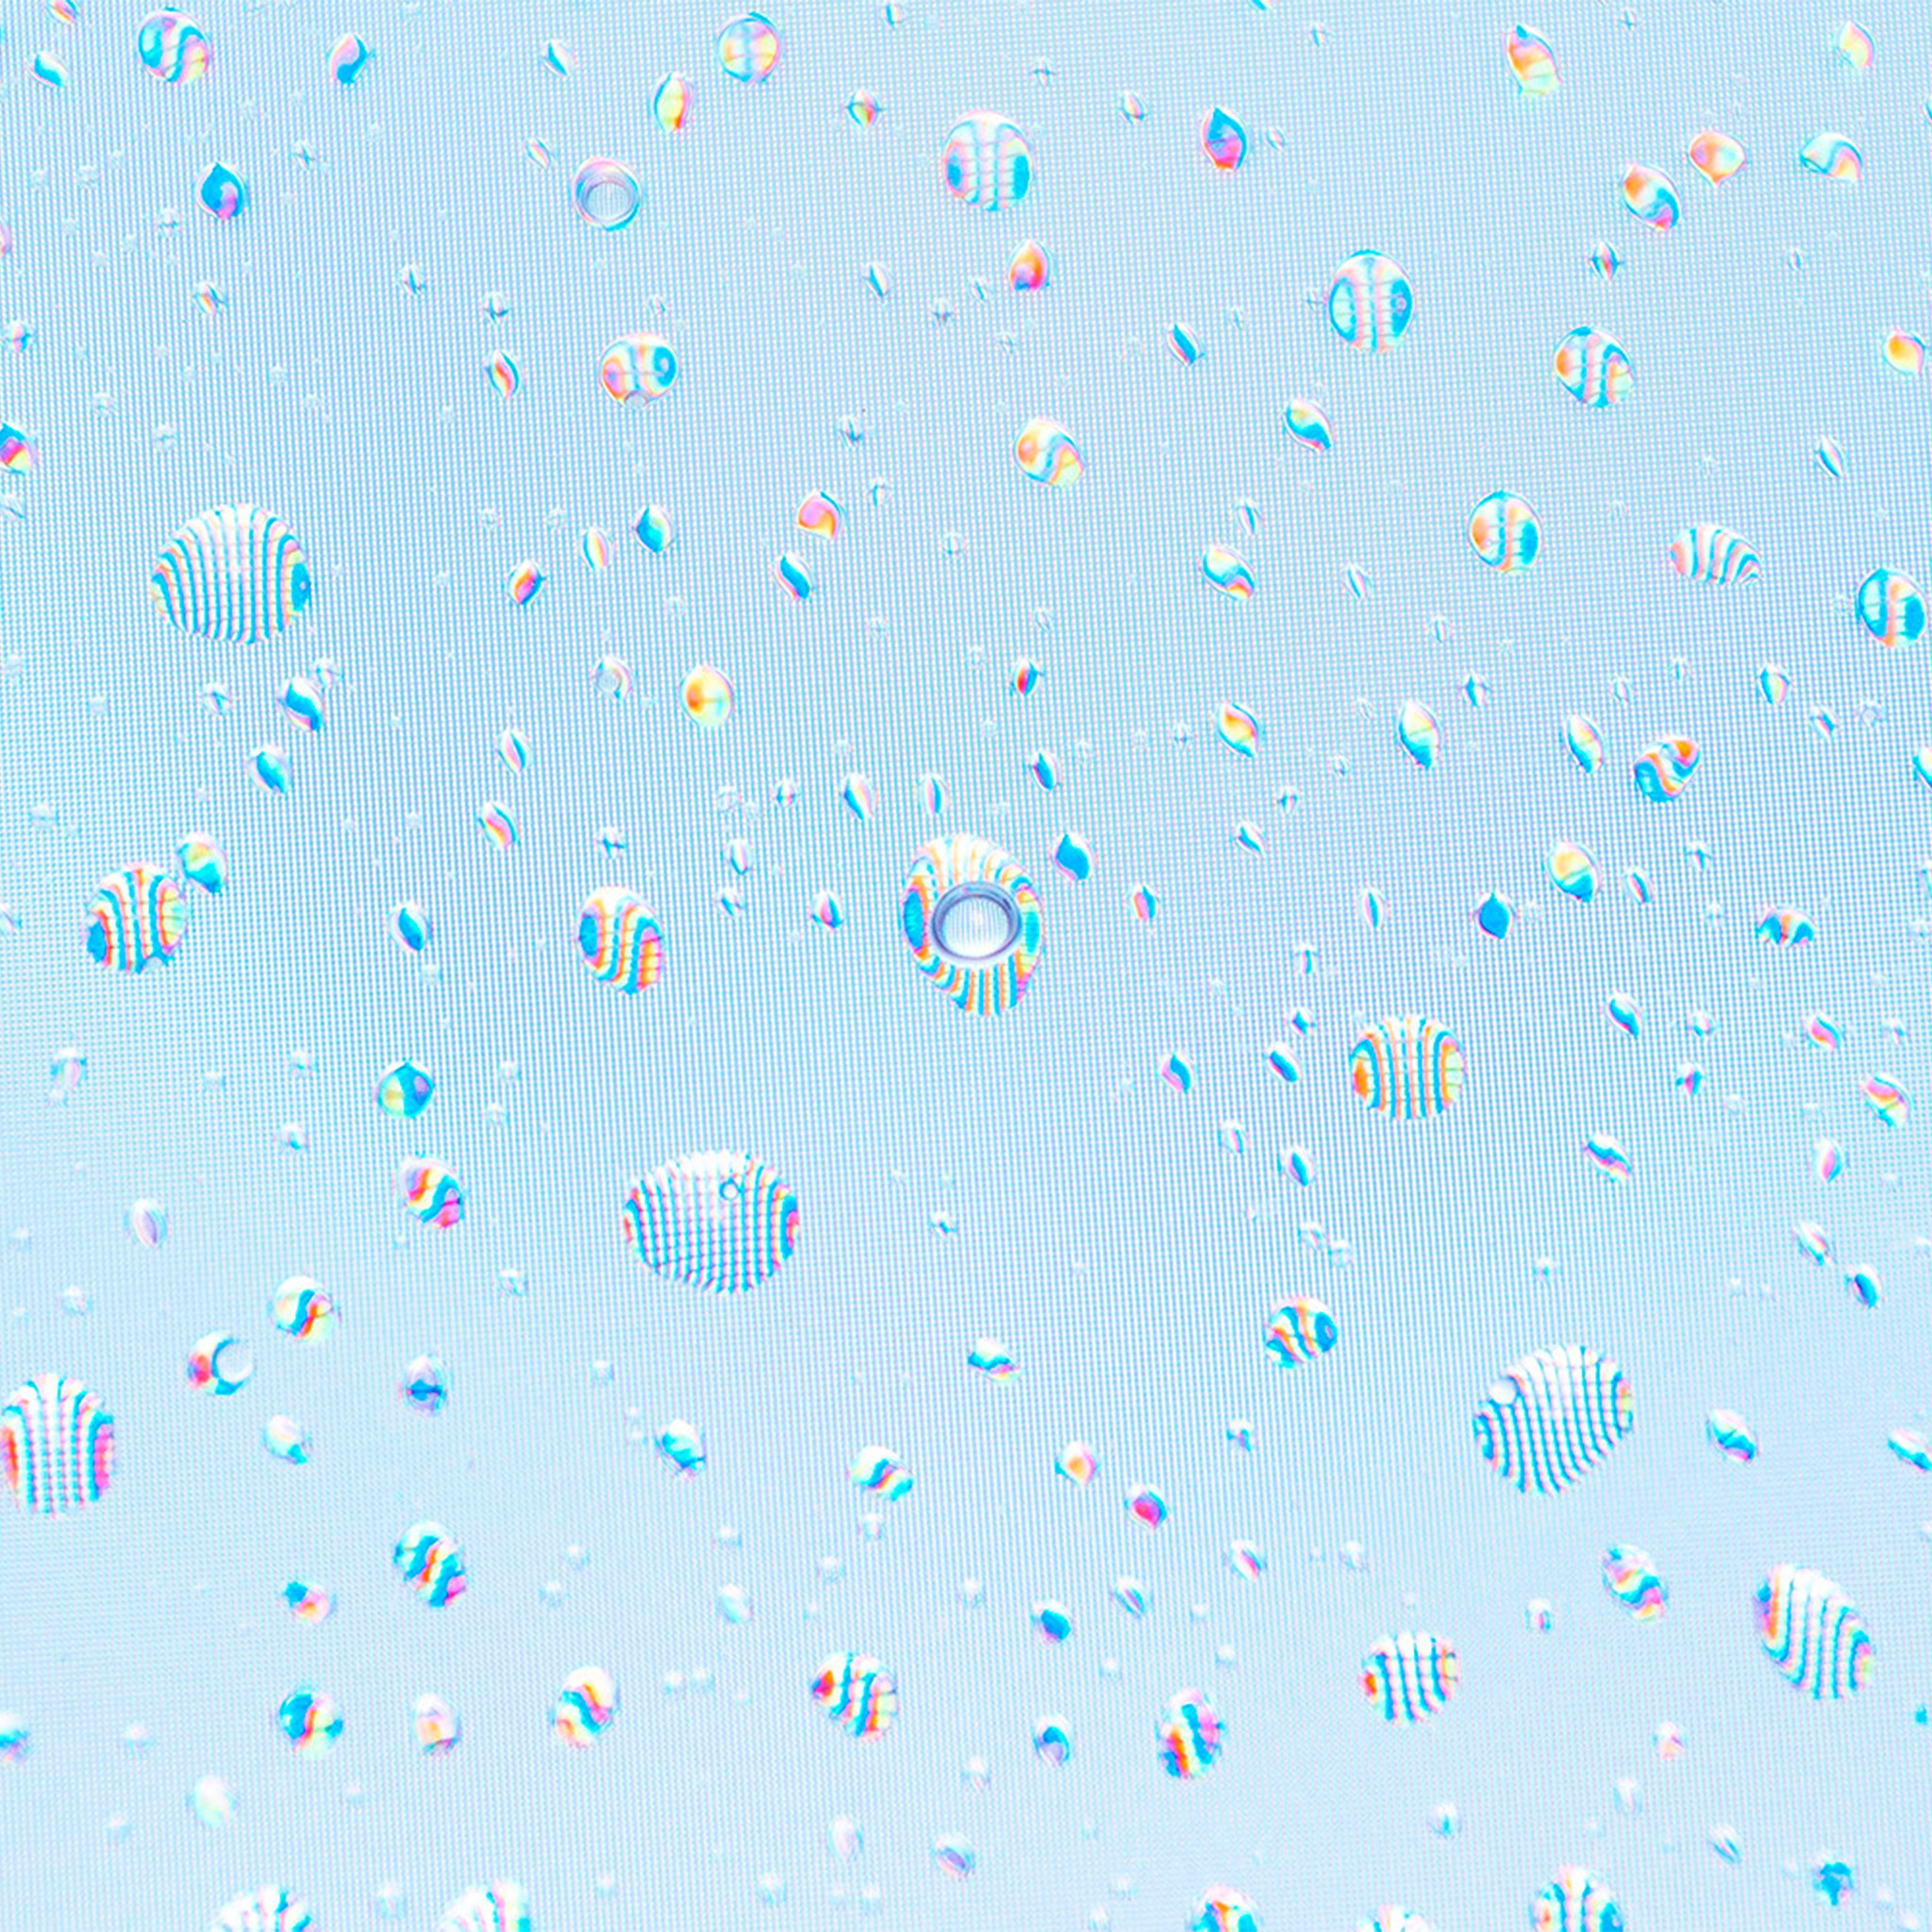 Wa94 Digital Rain Drop Light Pattern Background Wallpaper